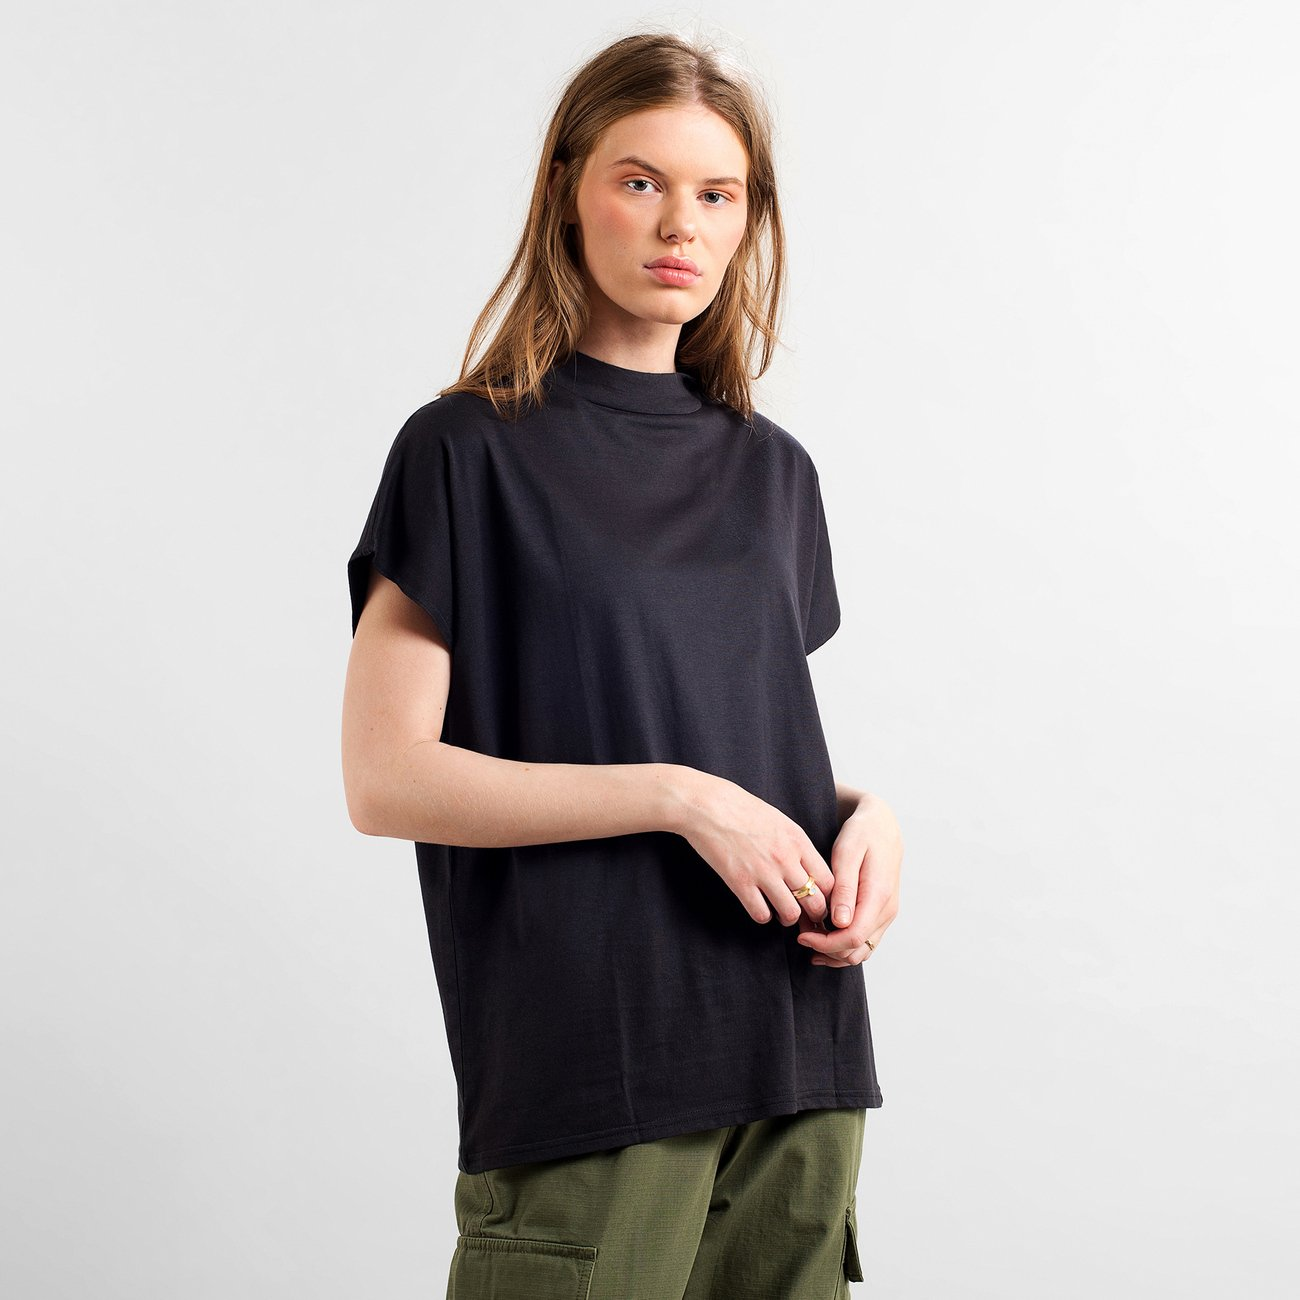 DEDICATED-FLOR-TOP-T-shirt-charcoal1